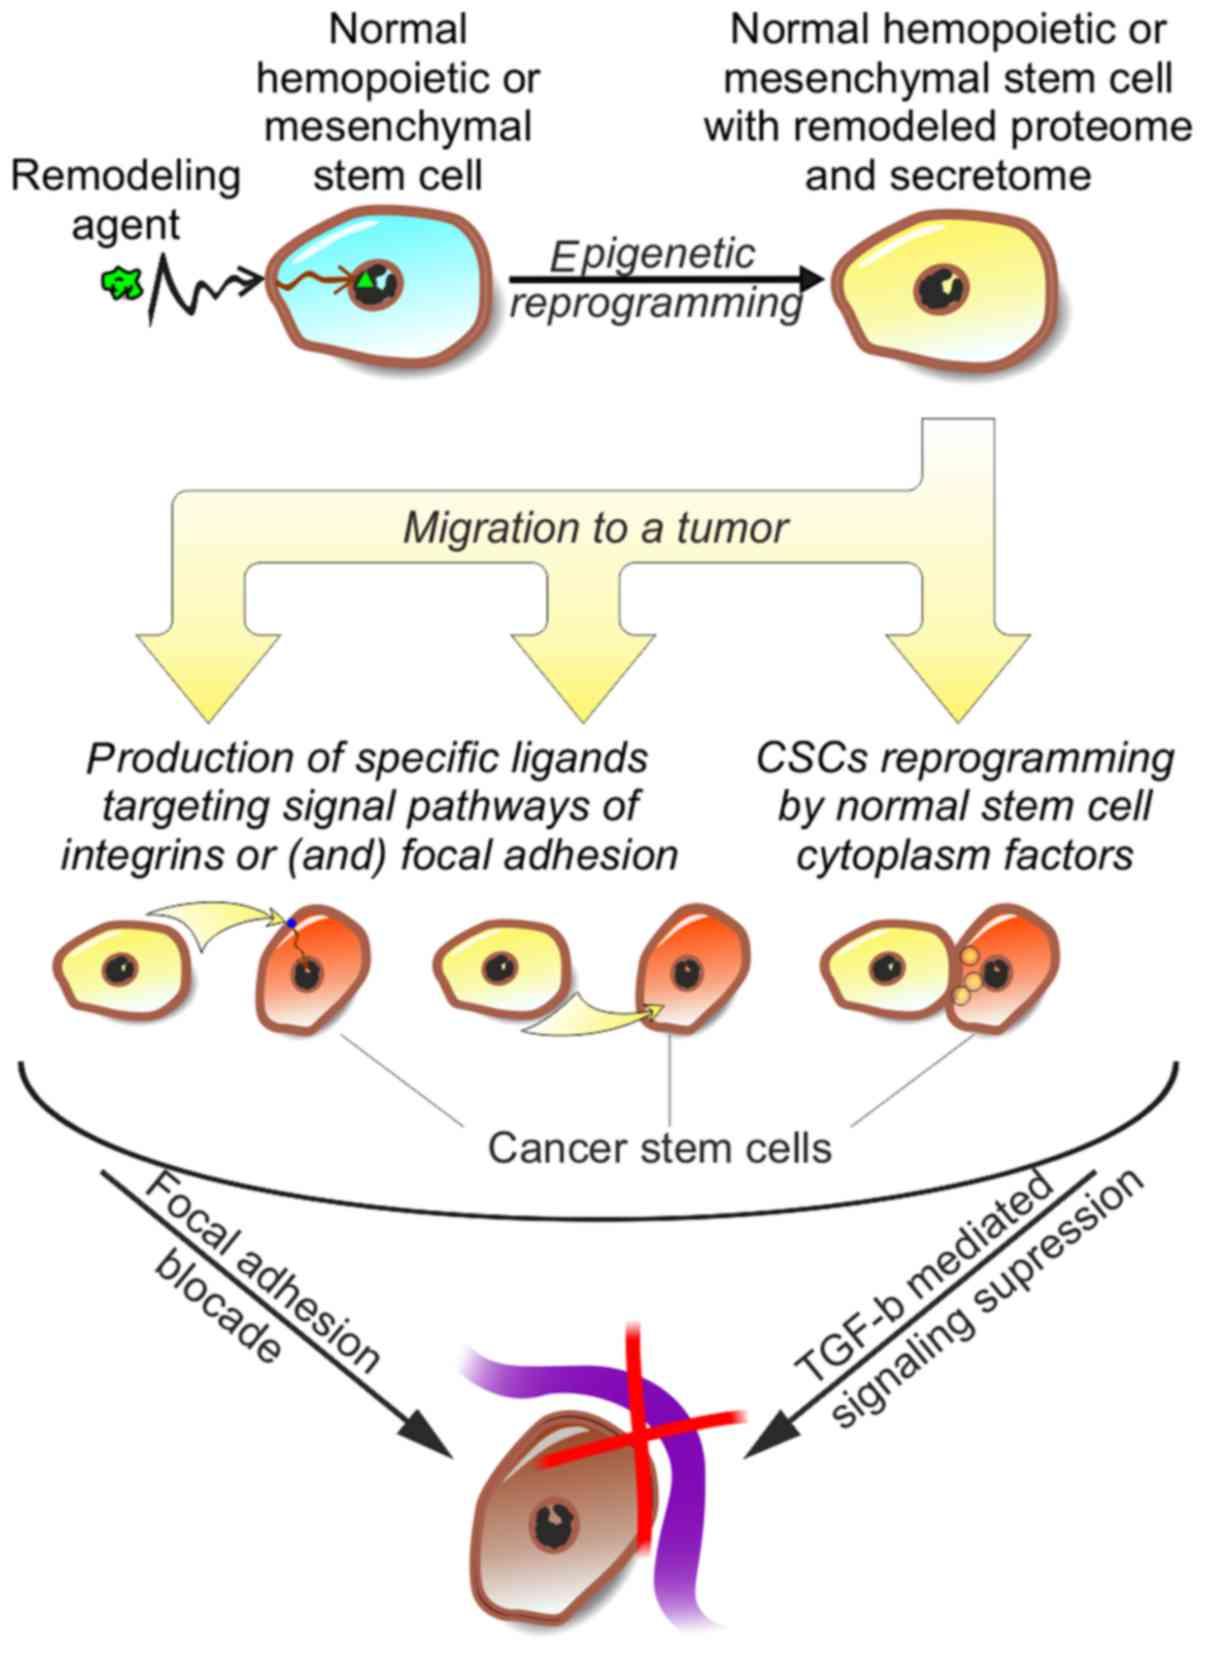 Personalized regulation of glioblastoma cancer stem cells based on